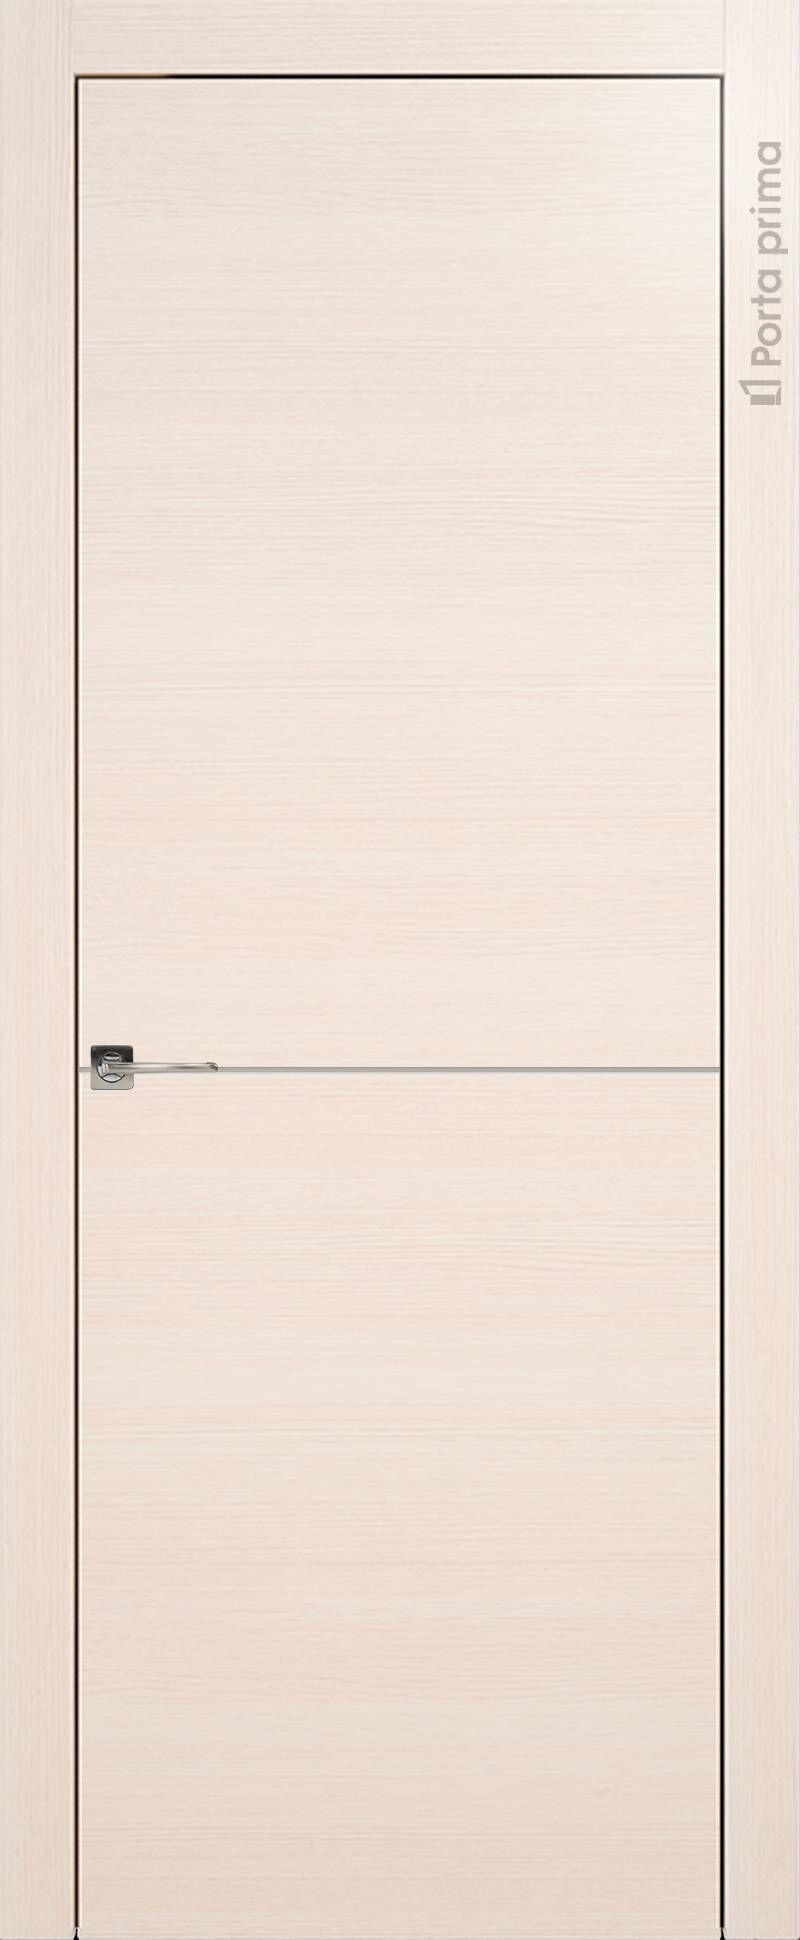 Tivoli Б-2 цвет - Беленый дуб Без стекла (ДГ)